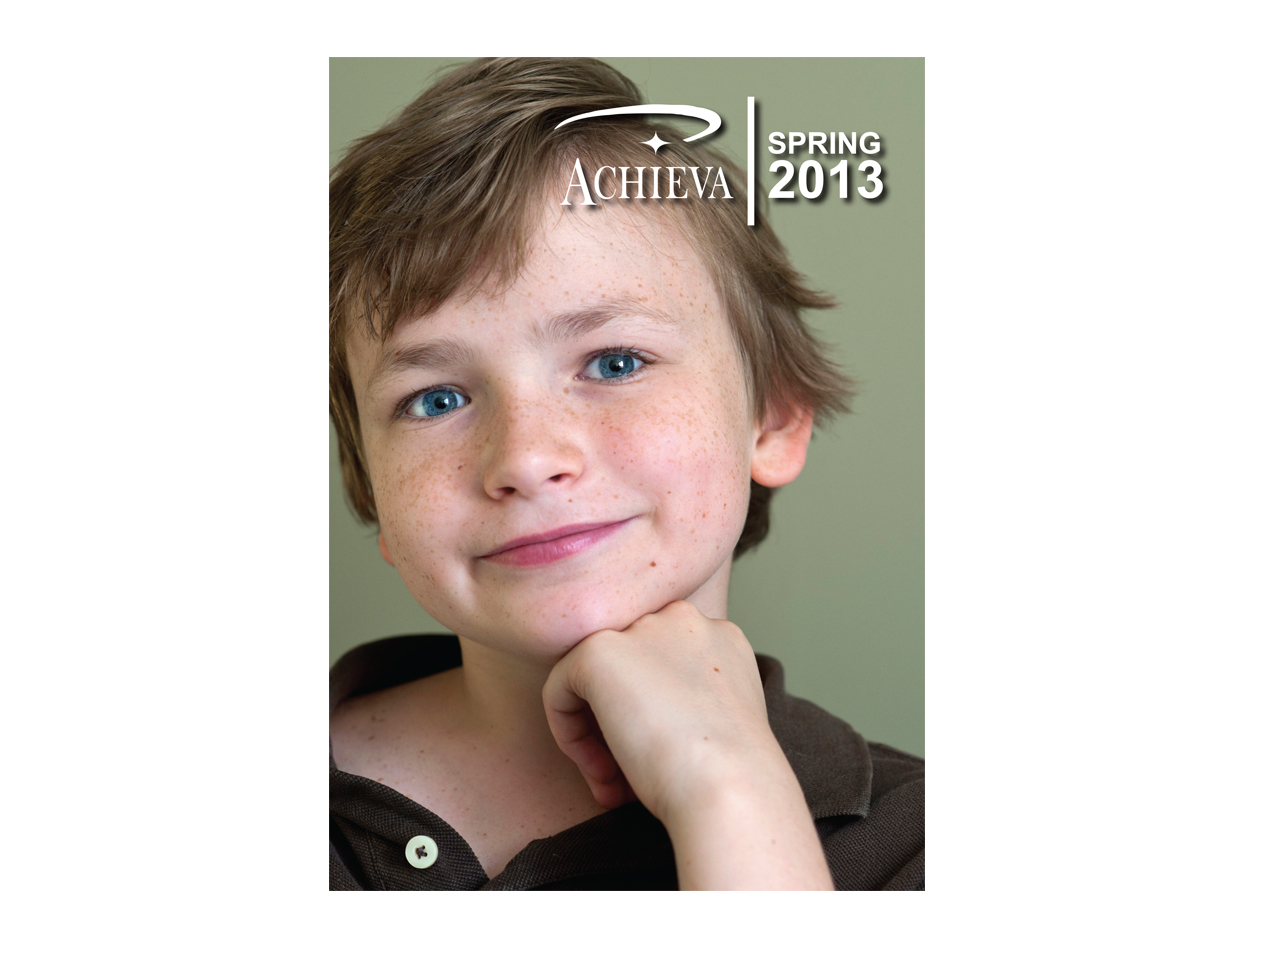 ACHIEVA 2013 Spring Newsletter